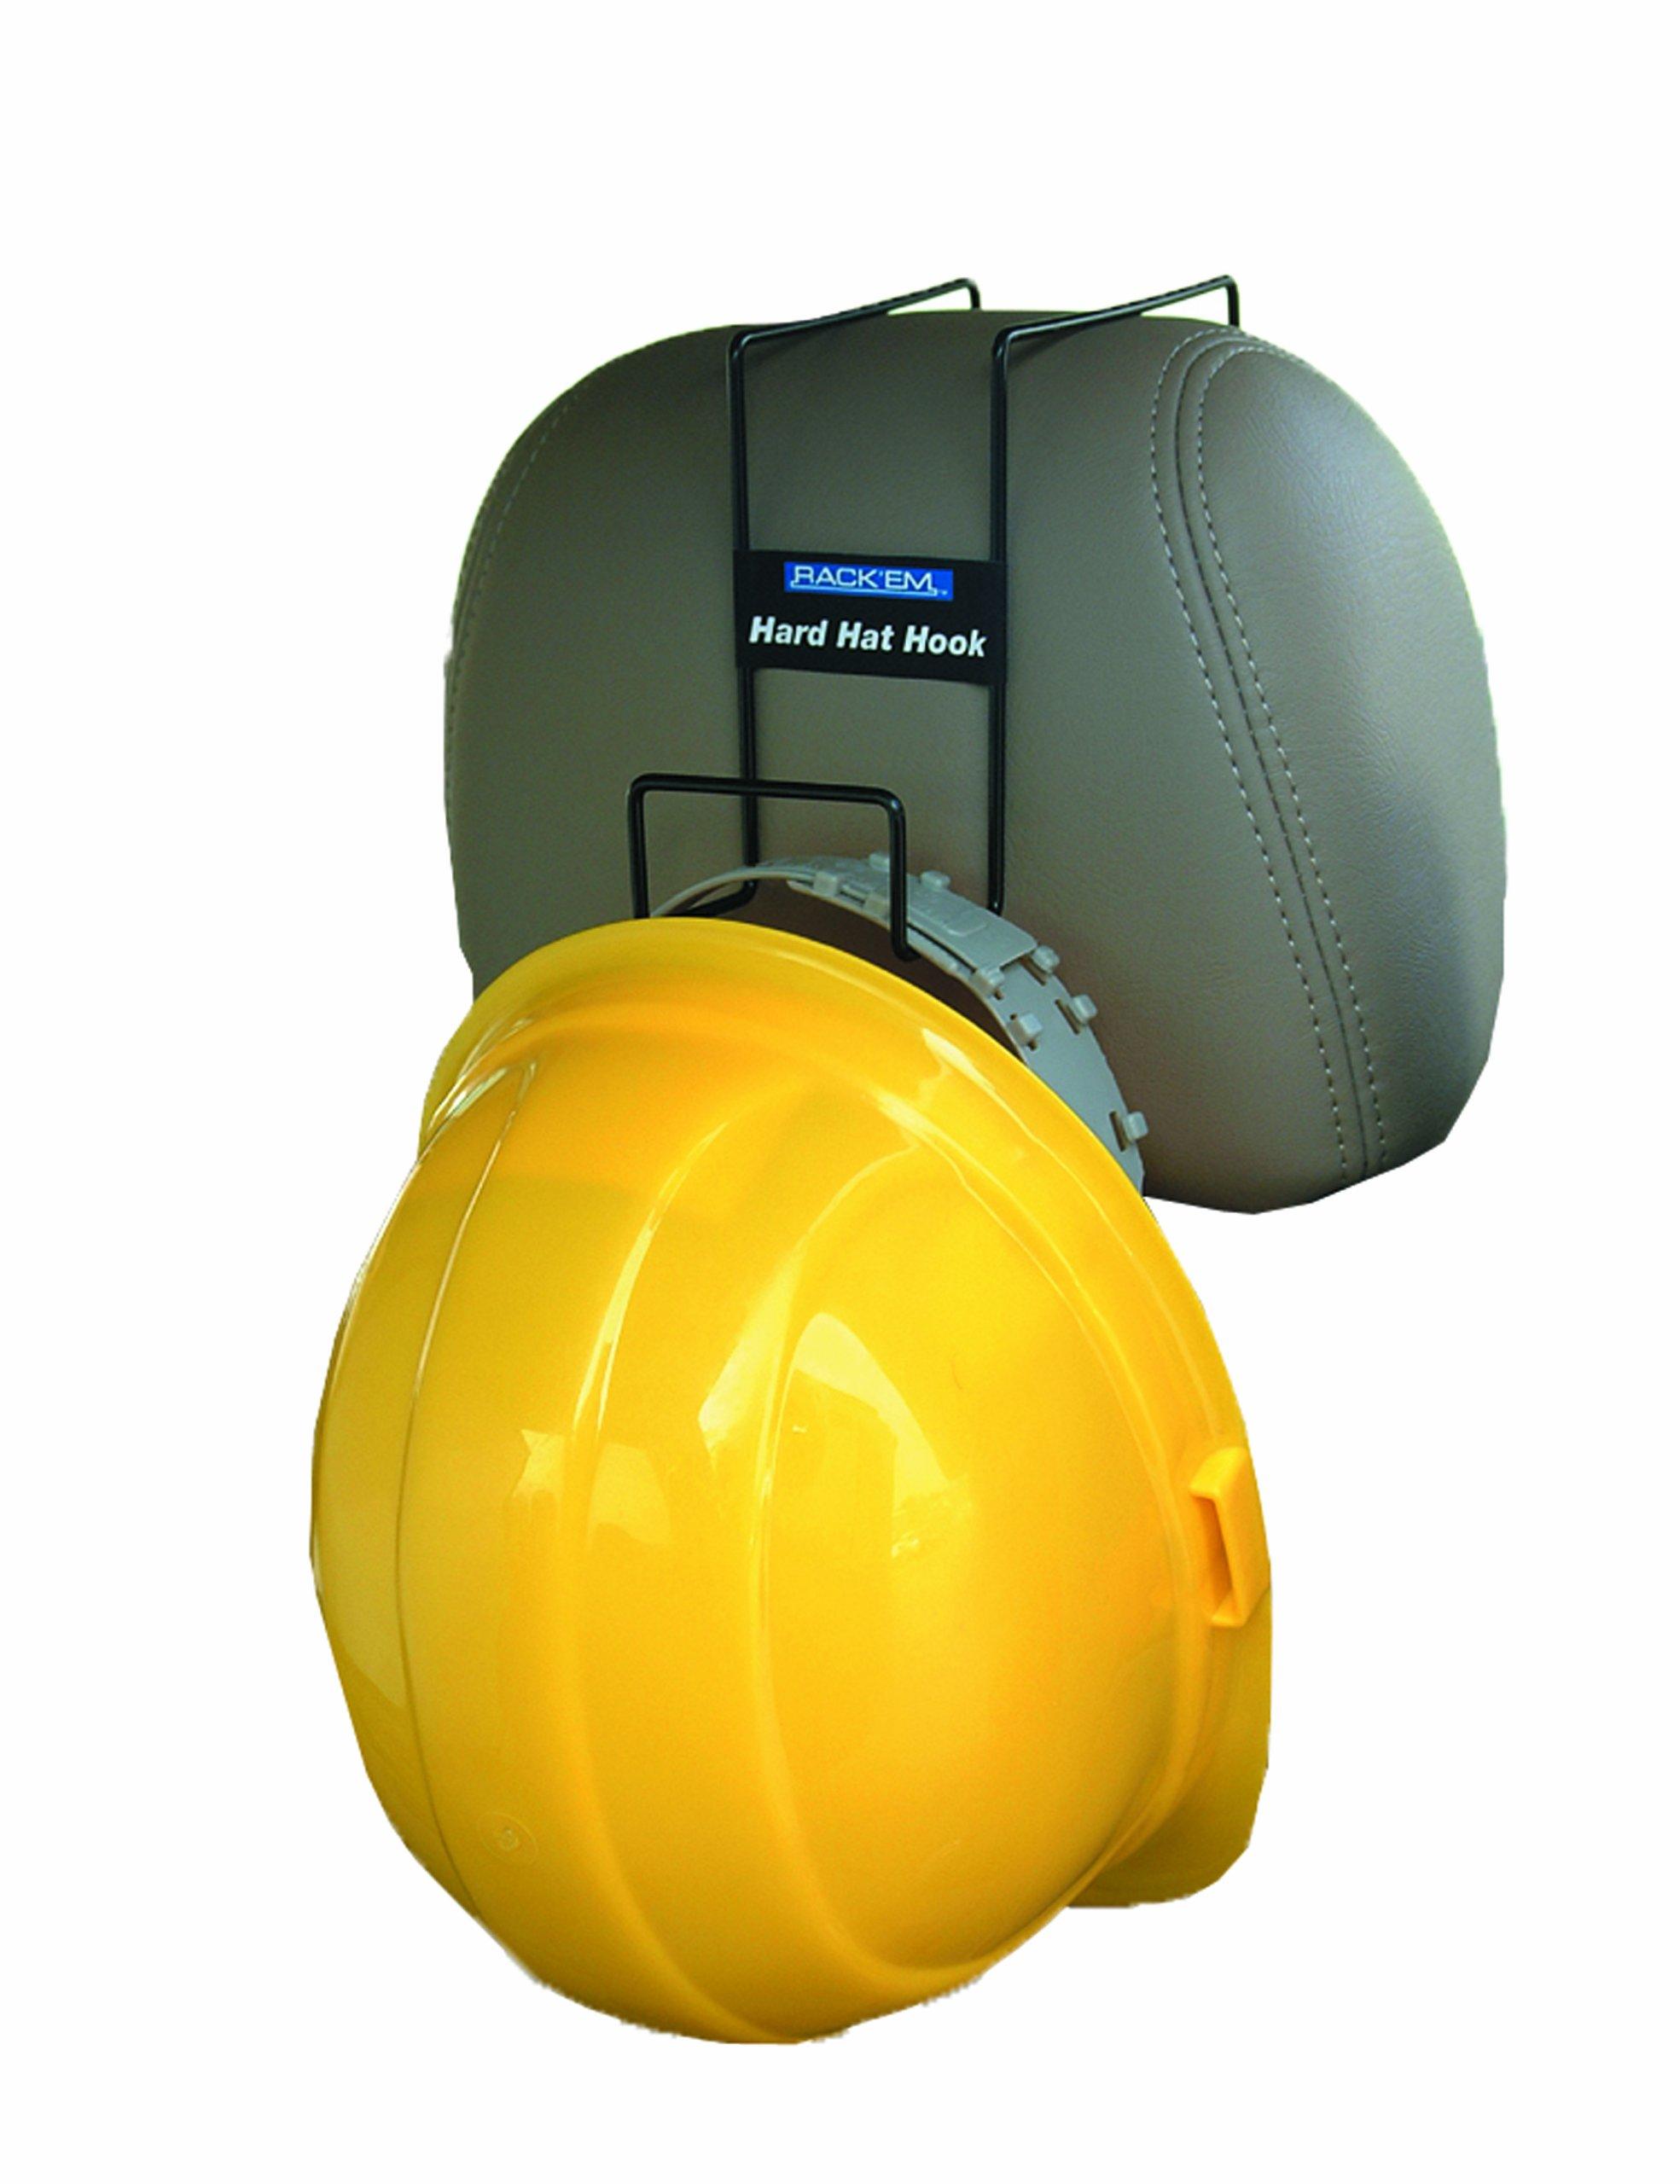 Horizon 5002 Sturdy Steel Over The Seat Hard Hat Rack, 2-1/2'' Width x 2-1/2'' Height x 2'' Depth